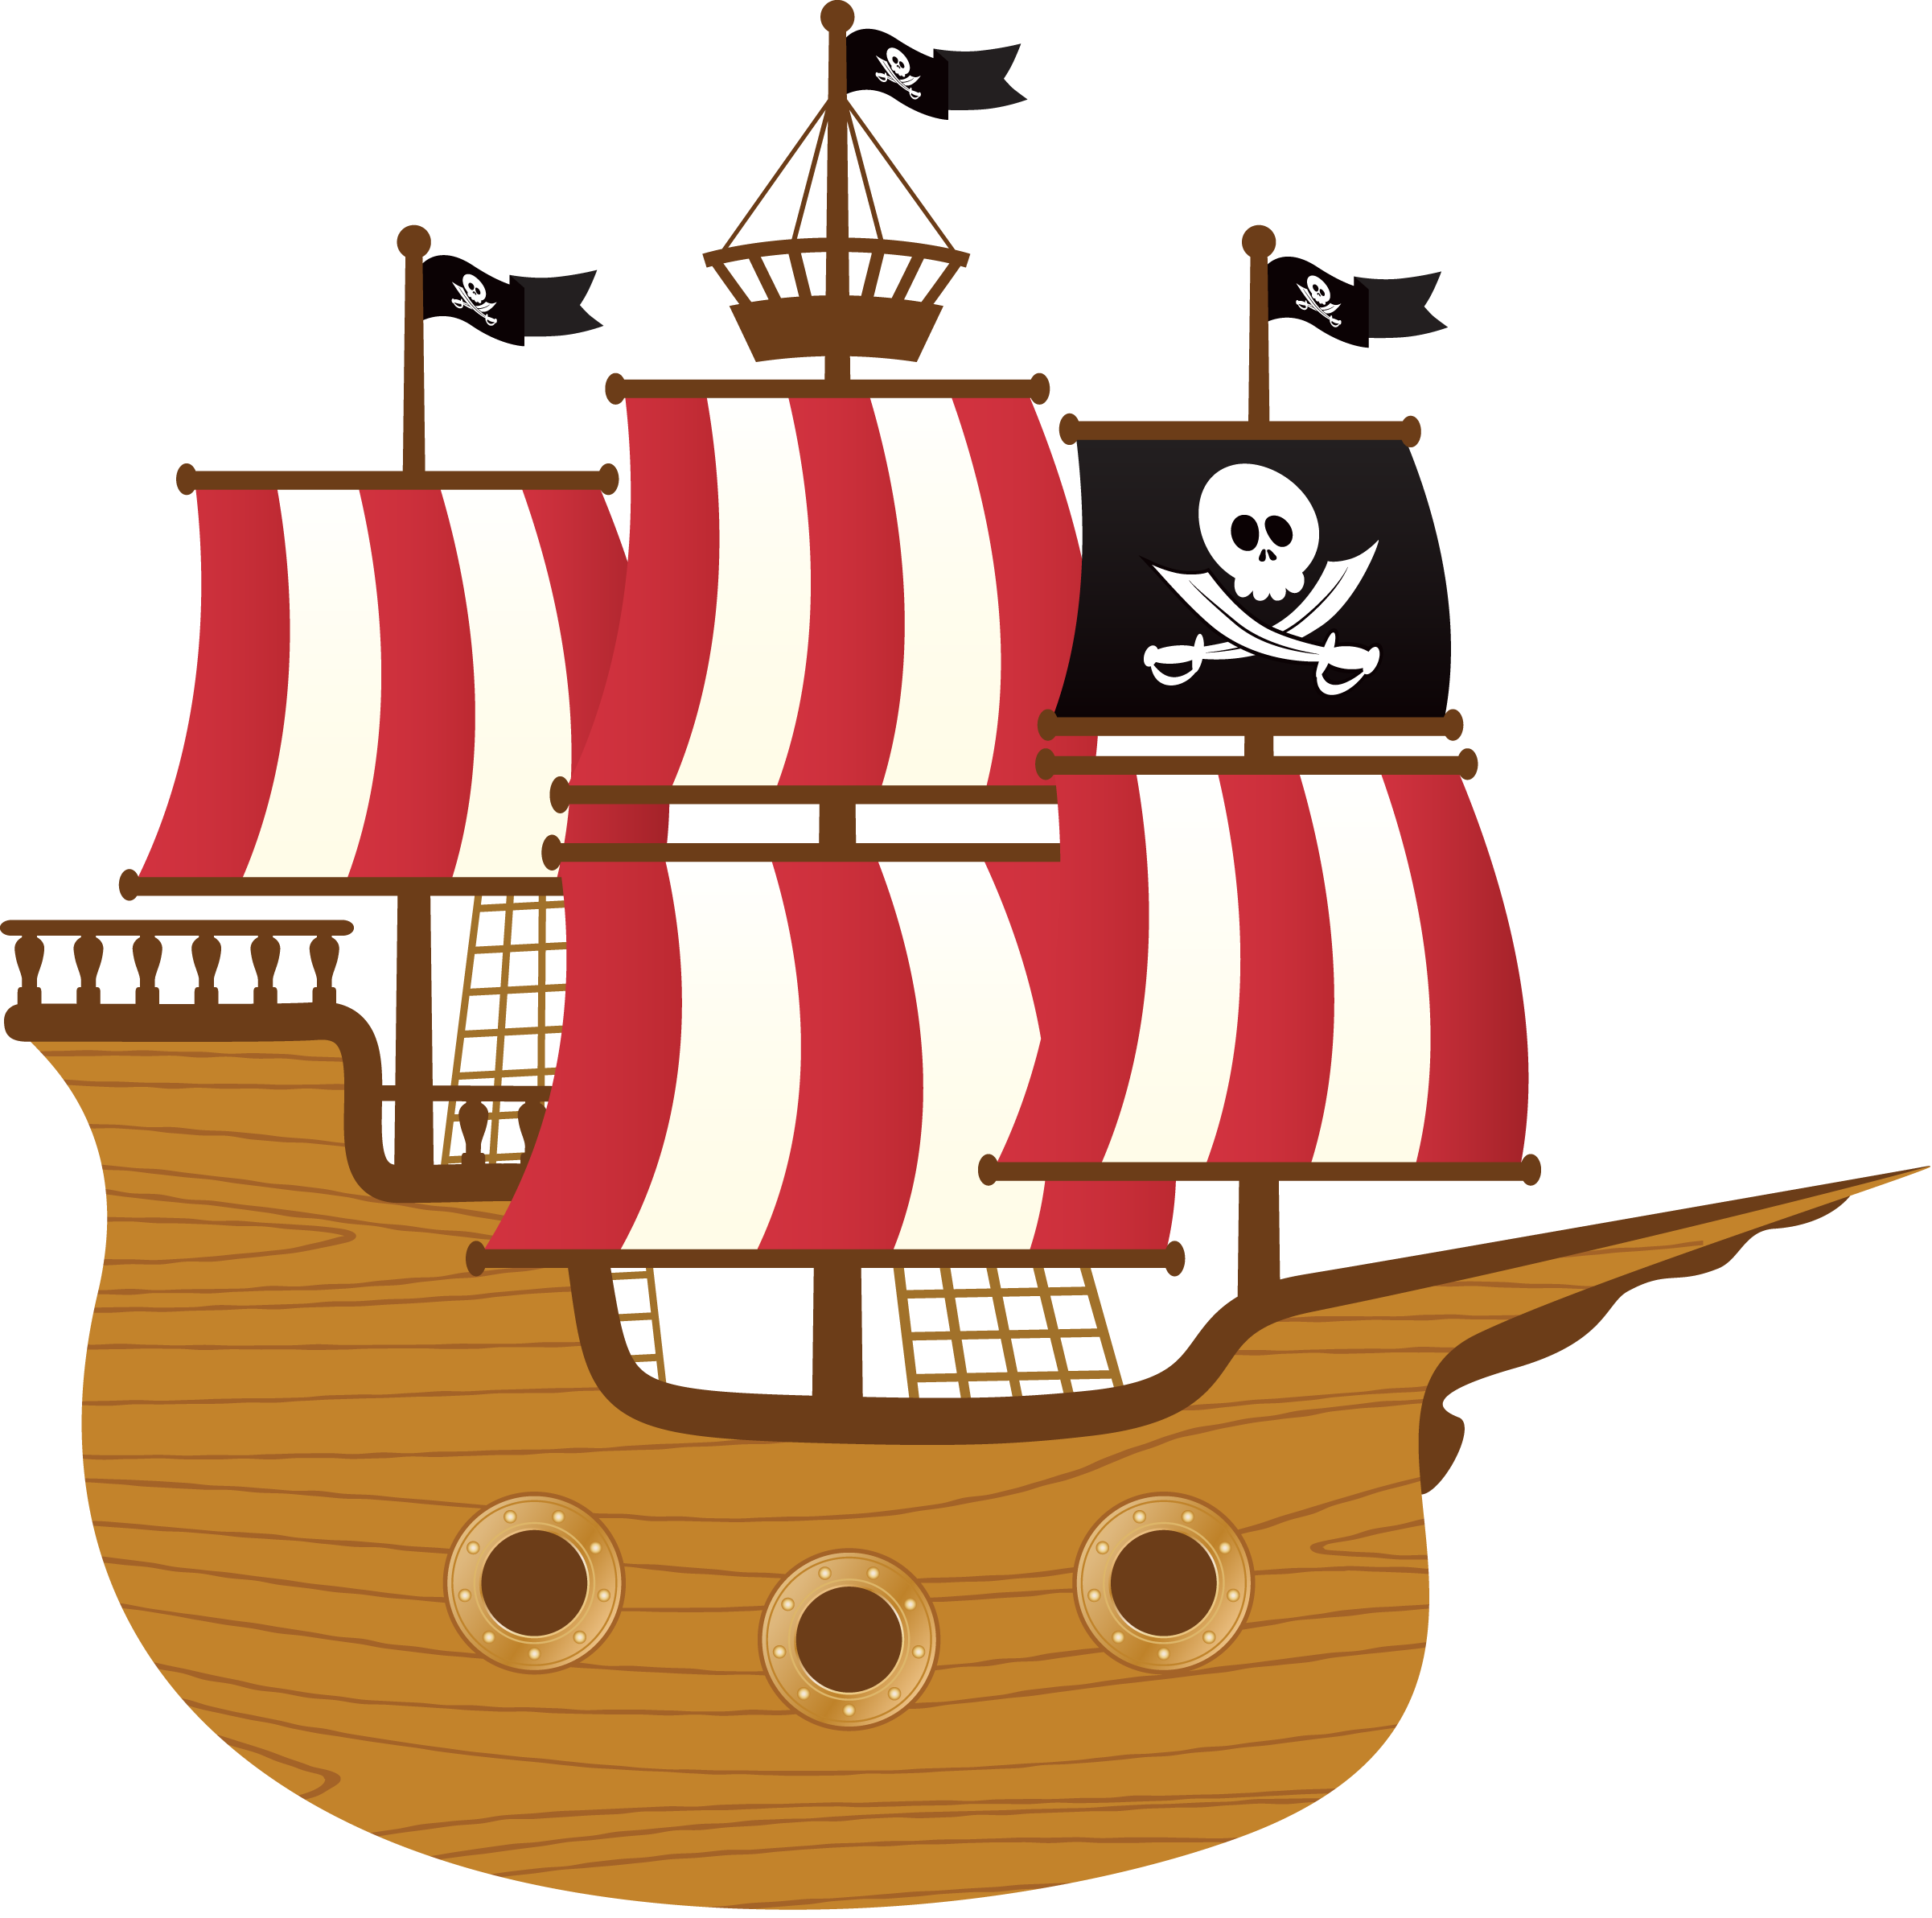 Ships Kids Drawings